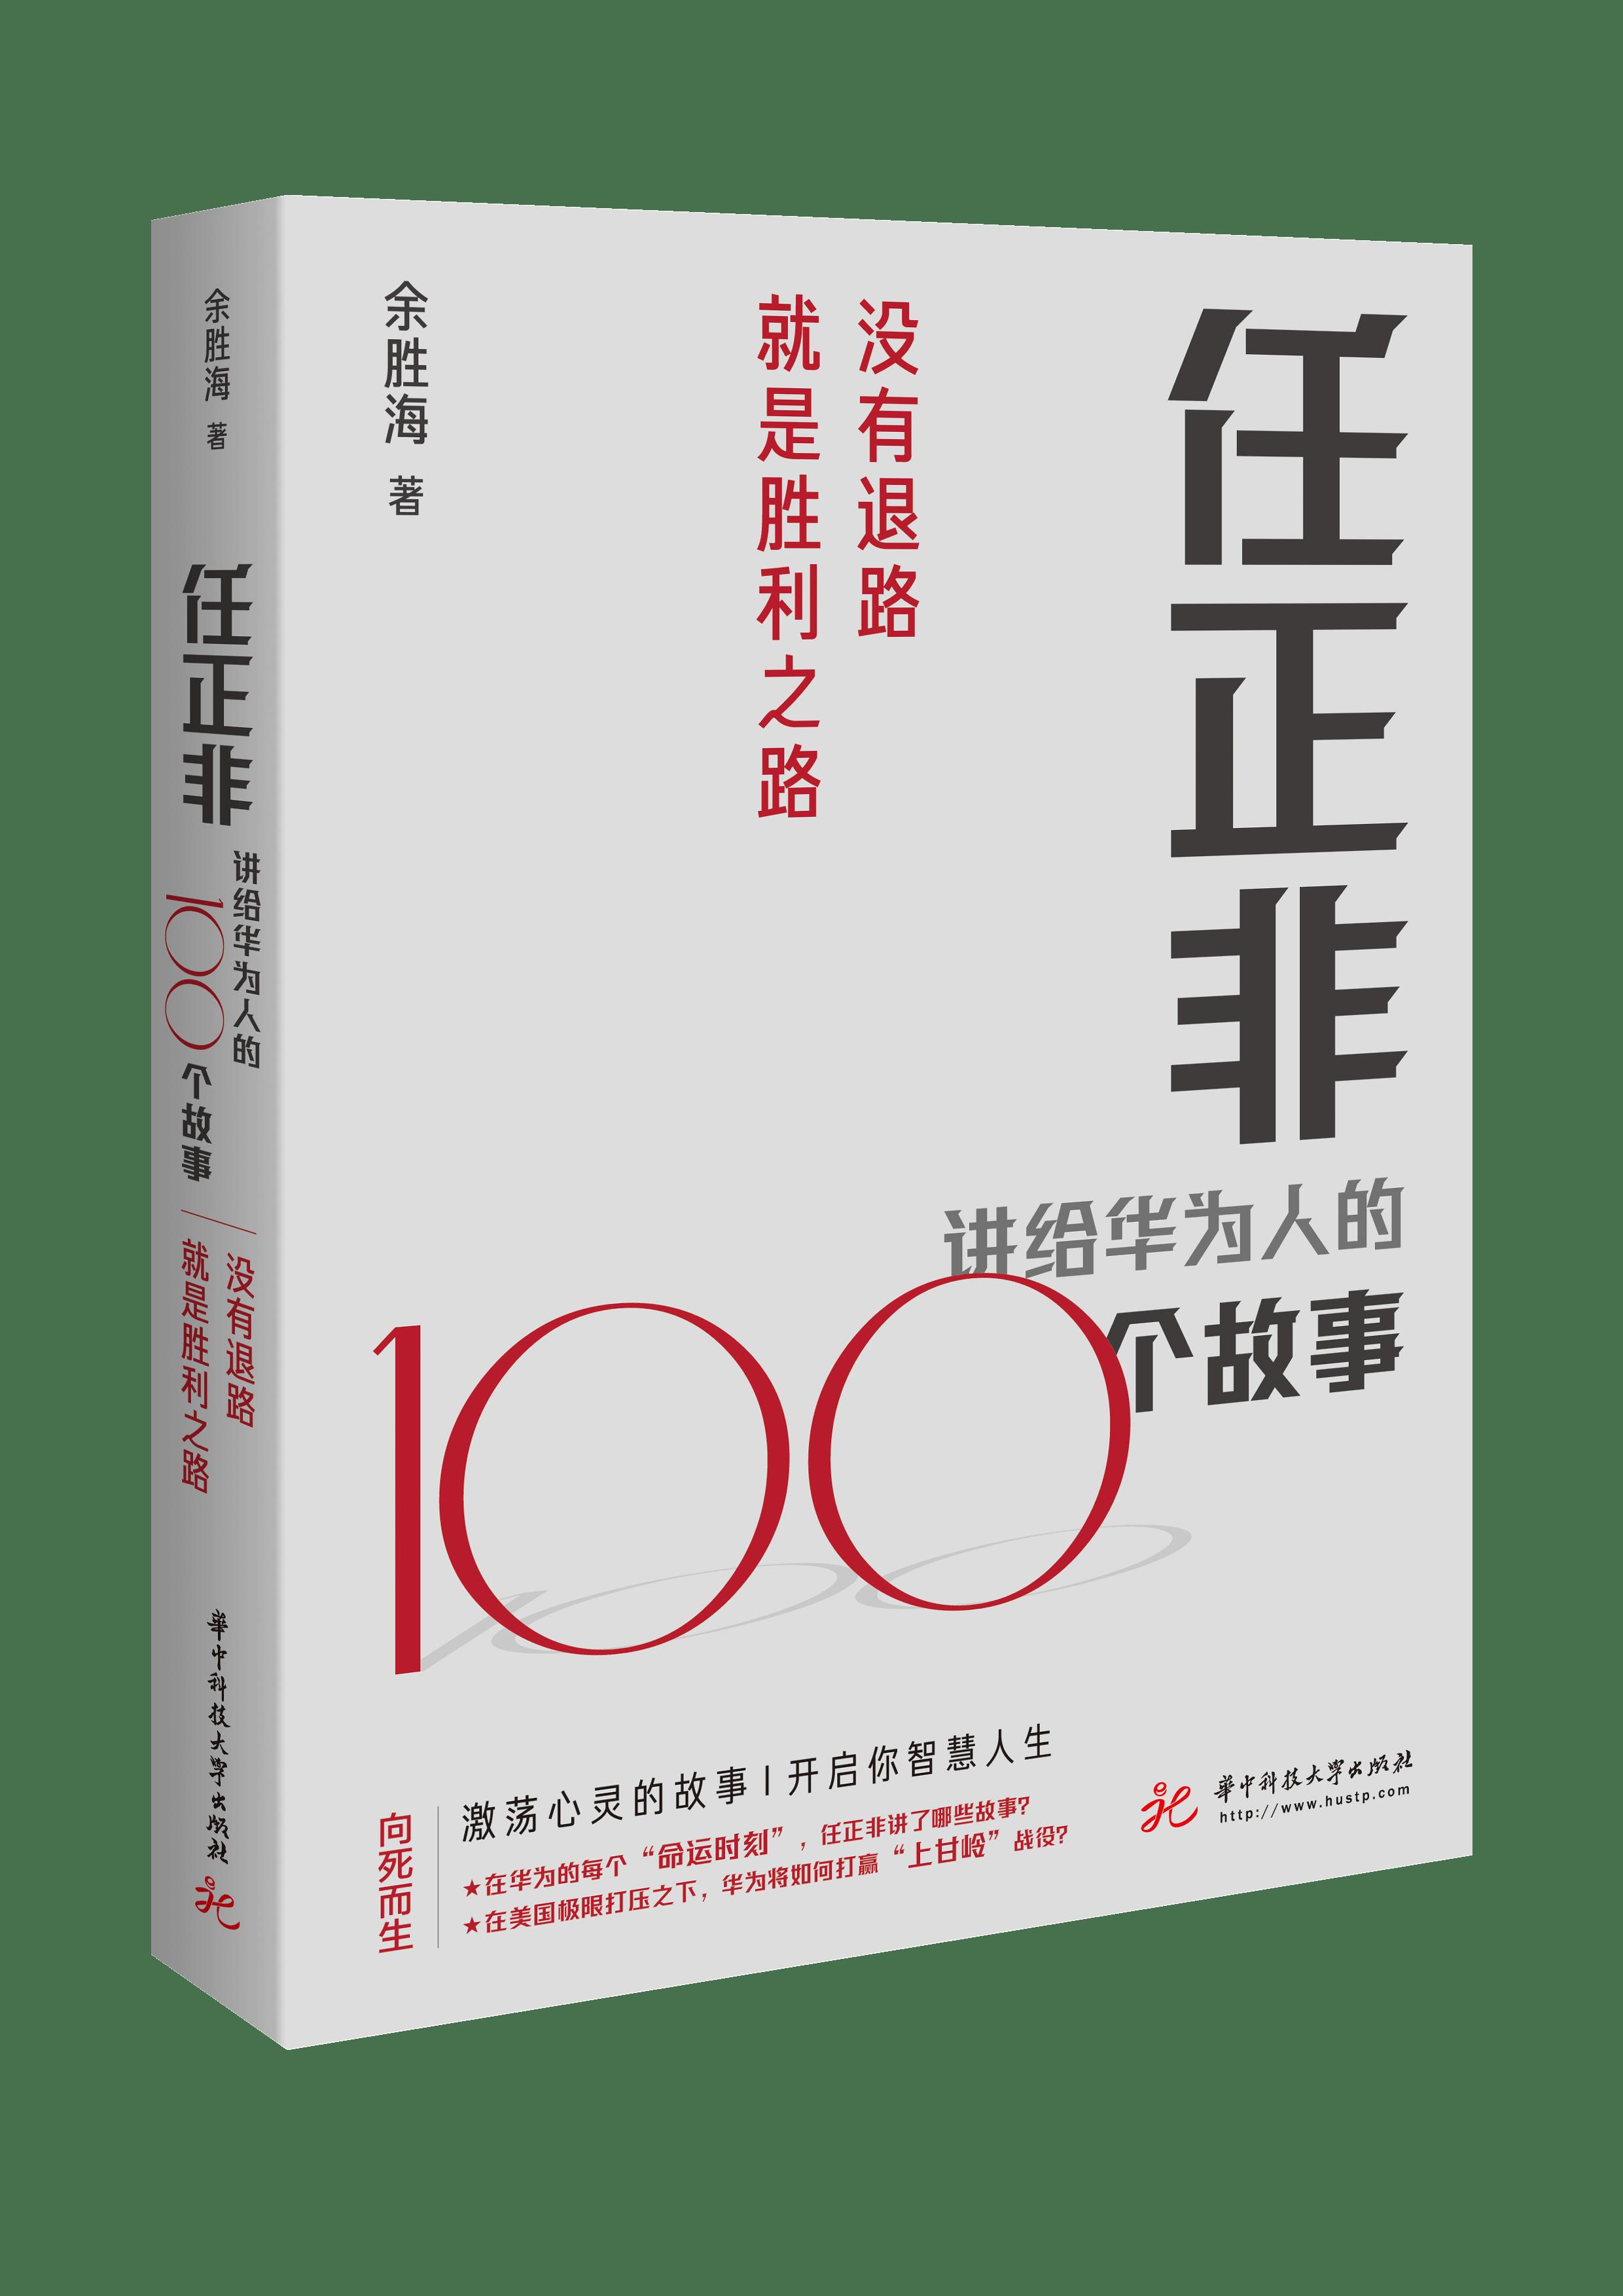 https://finance.zqcn.com.cn/csj/renwubaodao/130456.html